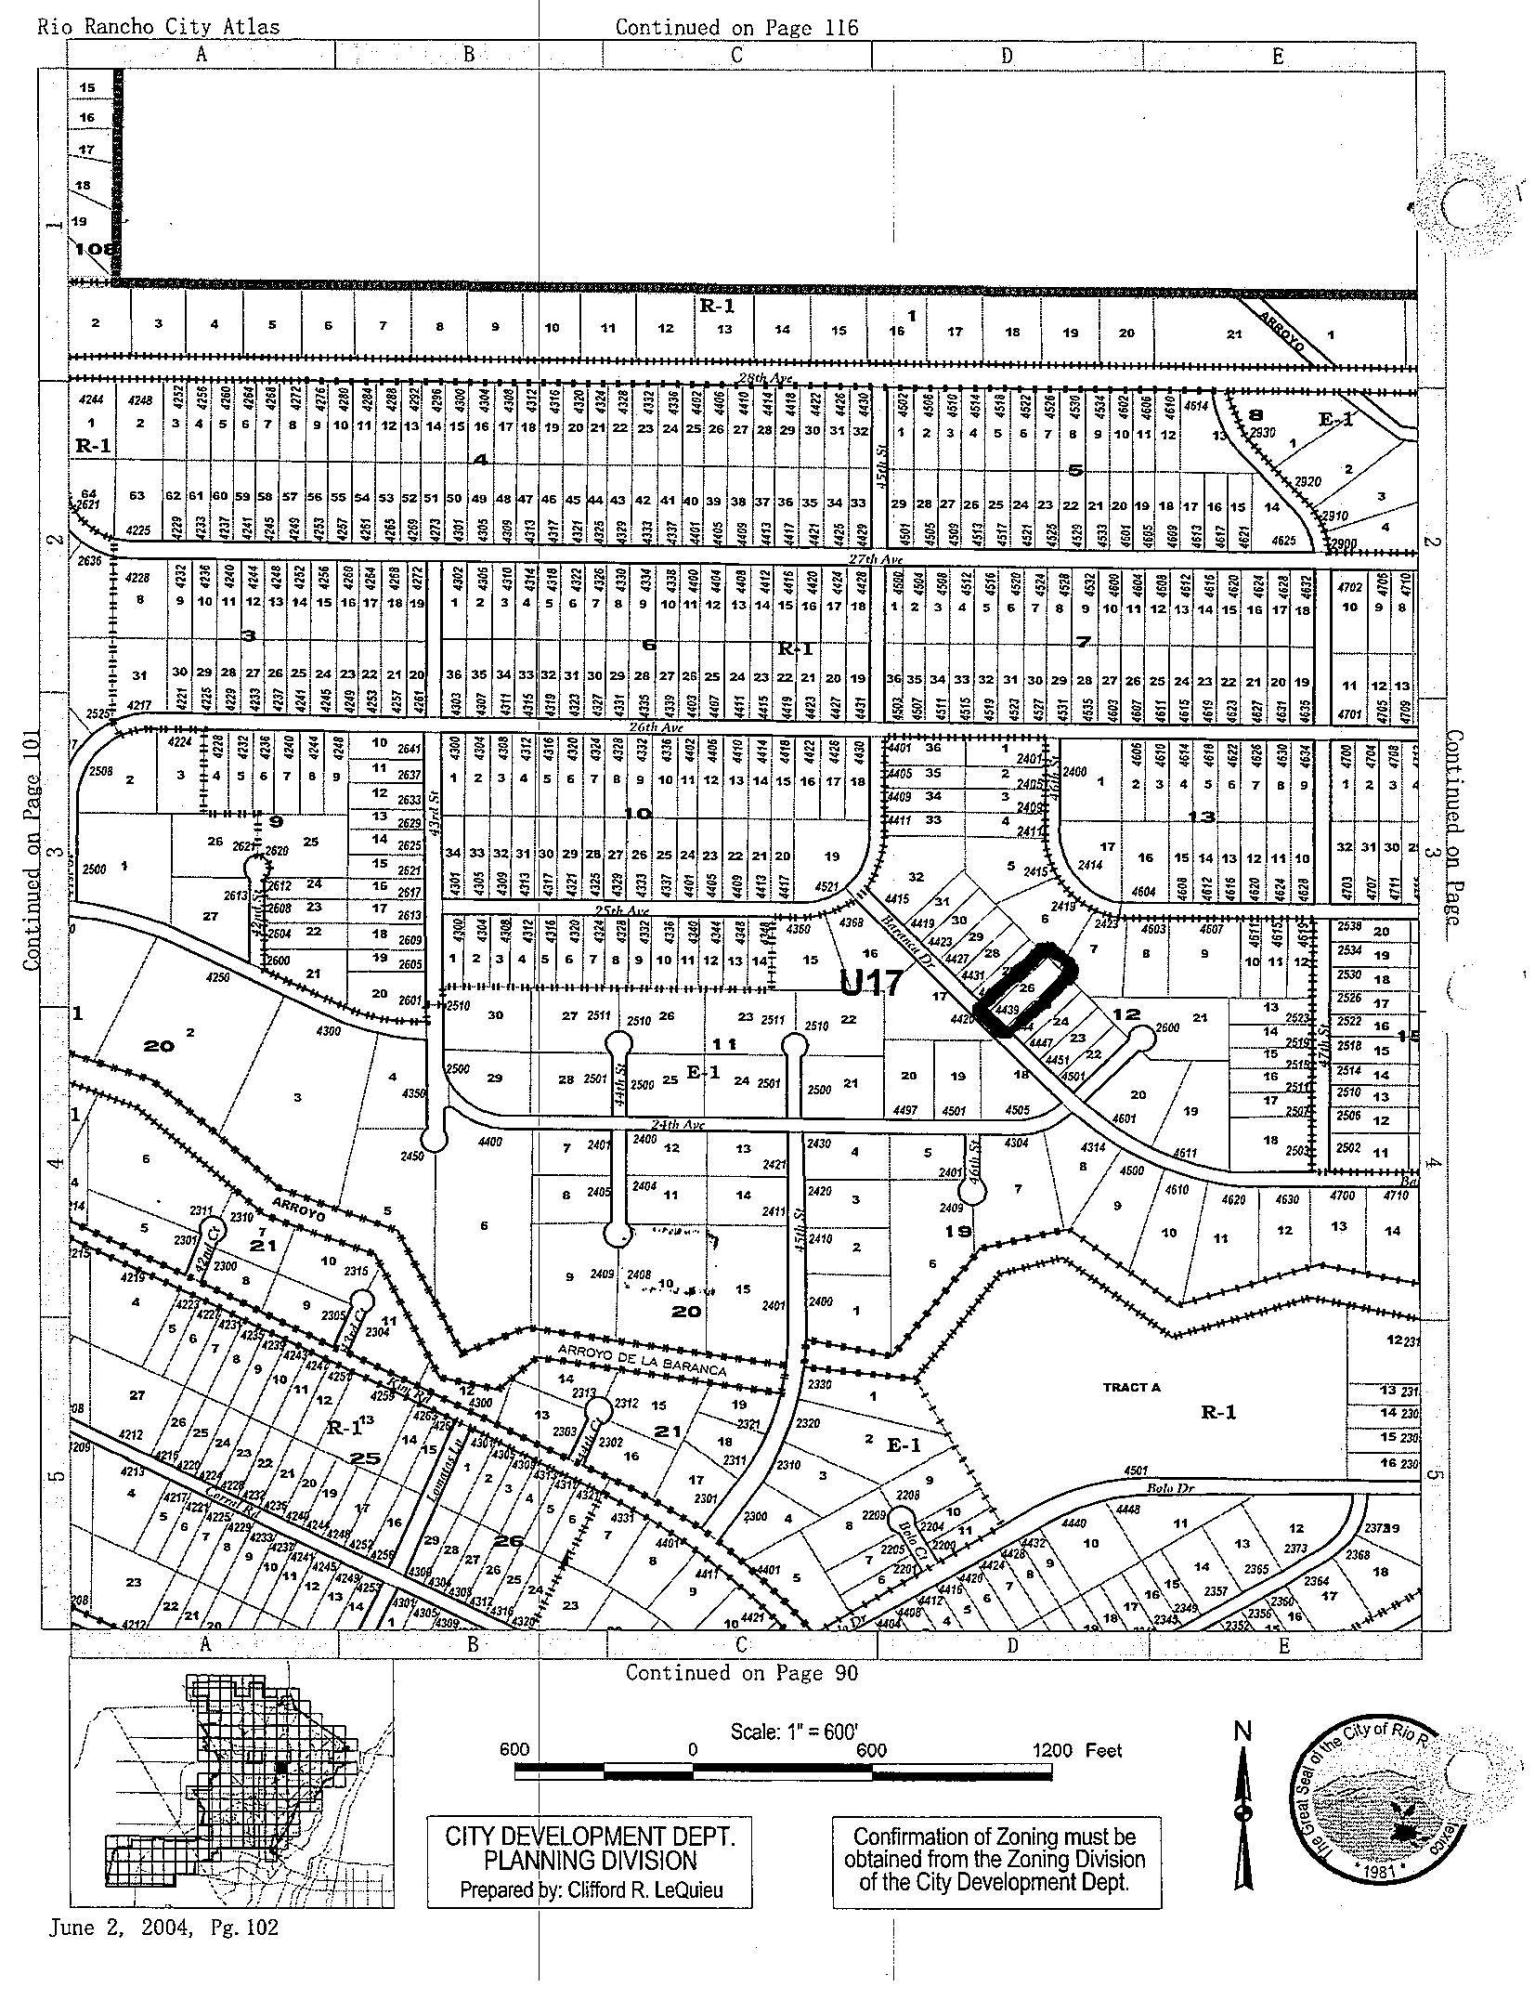 One of Rio Rancho Homes for Sale at 4439 Baranca(L26 B12 U17) Road NE